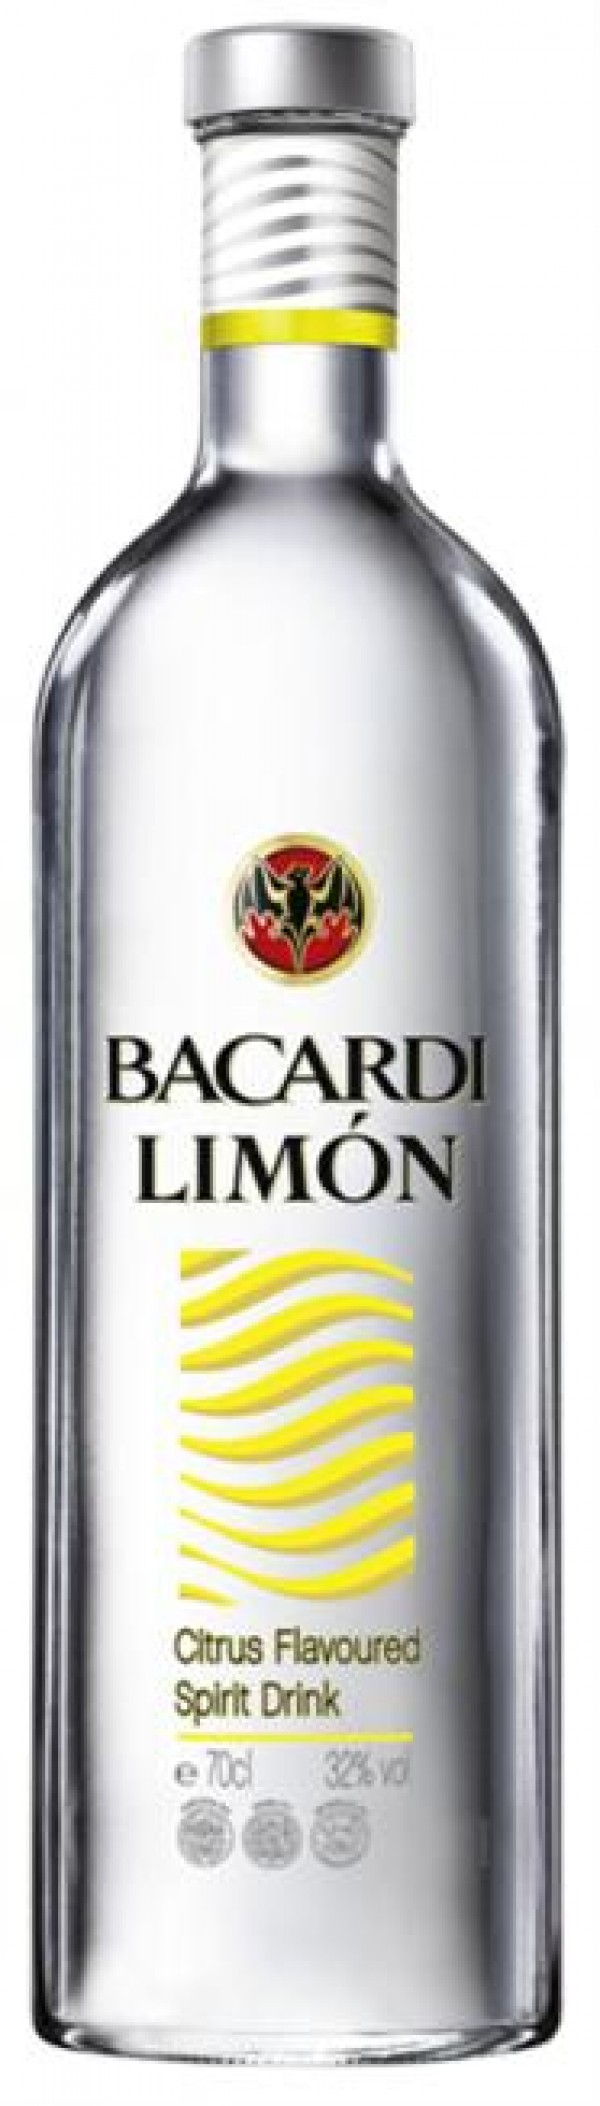 Bacardi Rum Limon